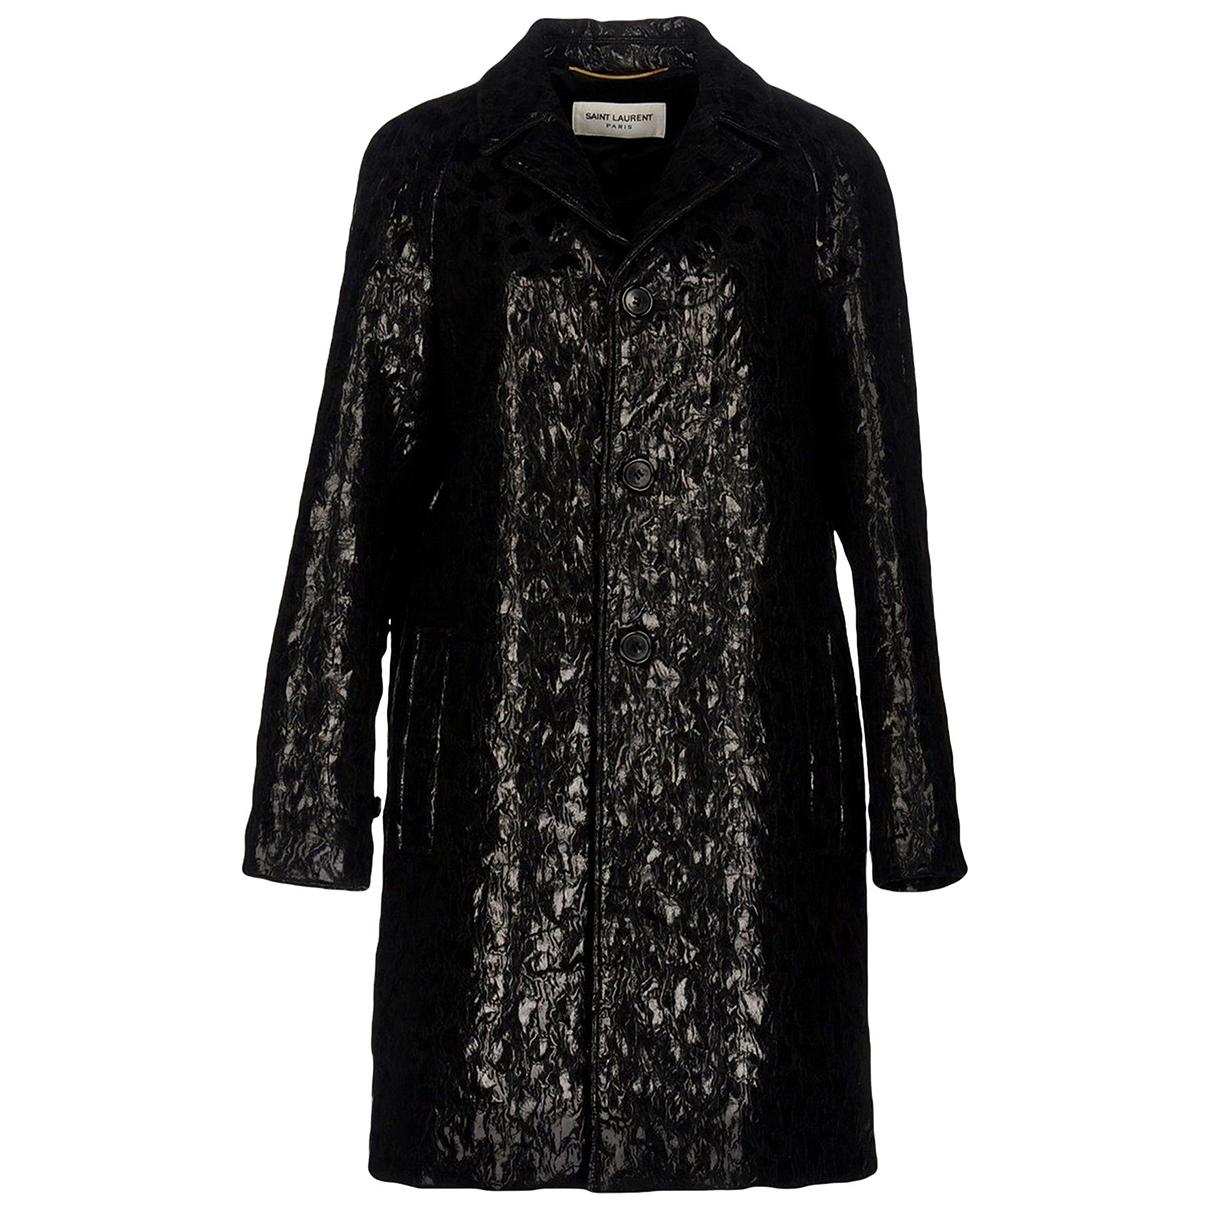 Saint Laurent N Black Coat for Women